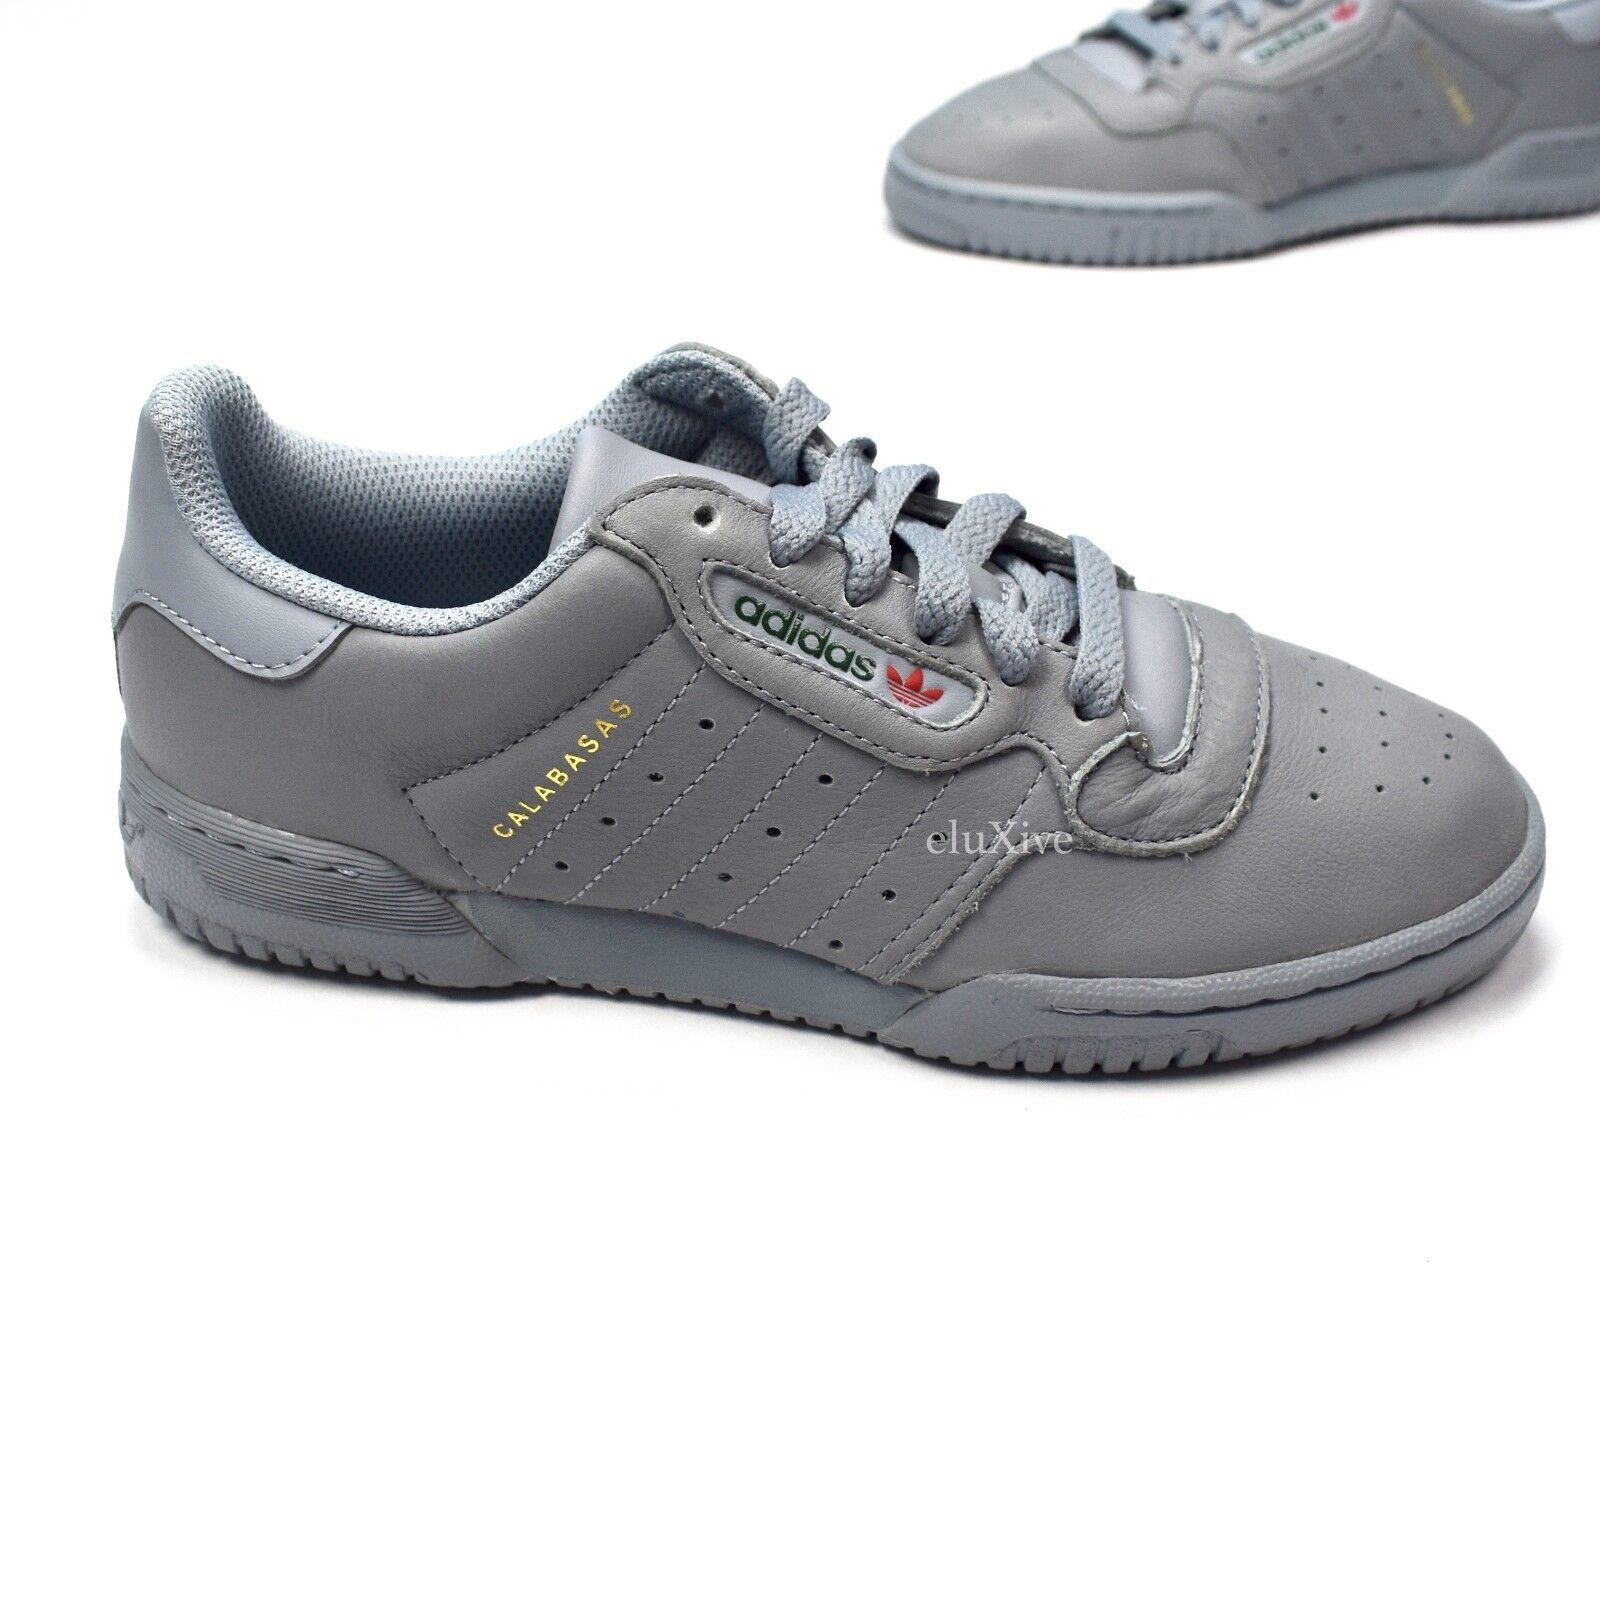 Nwt Nwt Nwt adidas yeezy powerphase pelle grigia calabasas scarpe scarpe 10 5 autentico 1a56ff